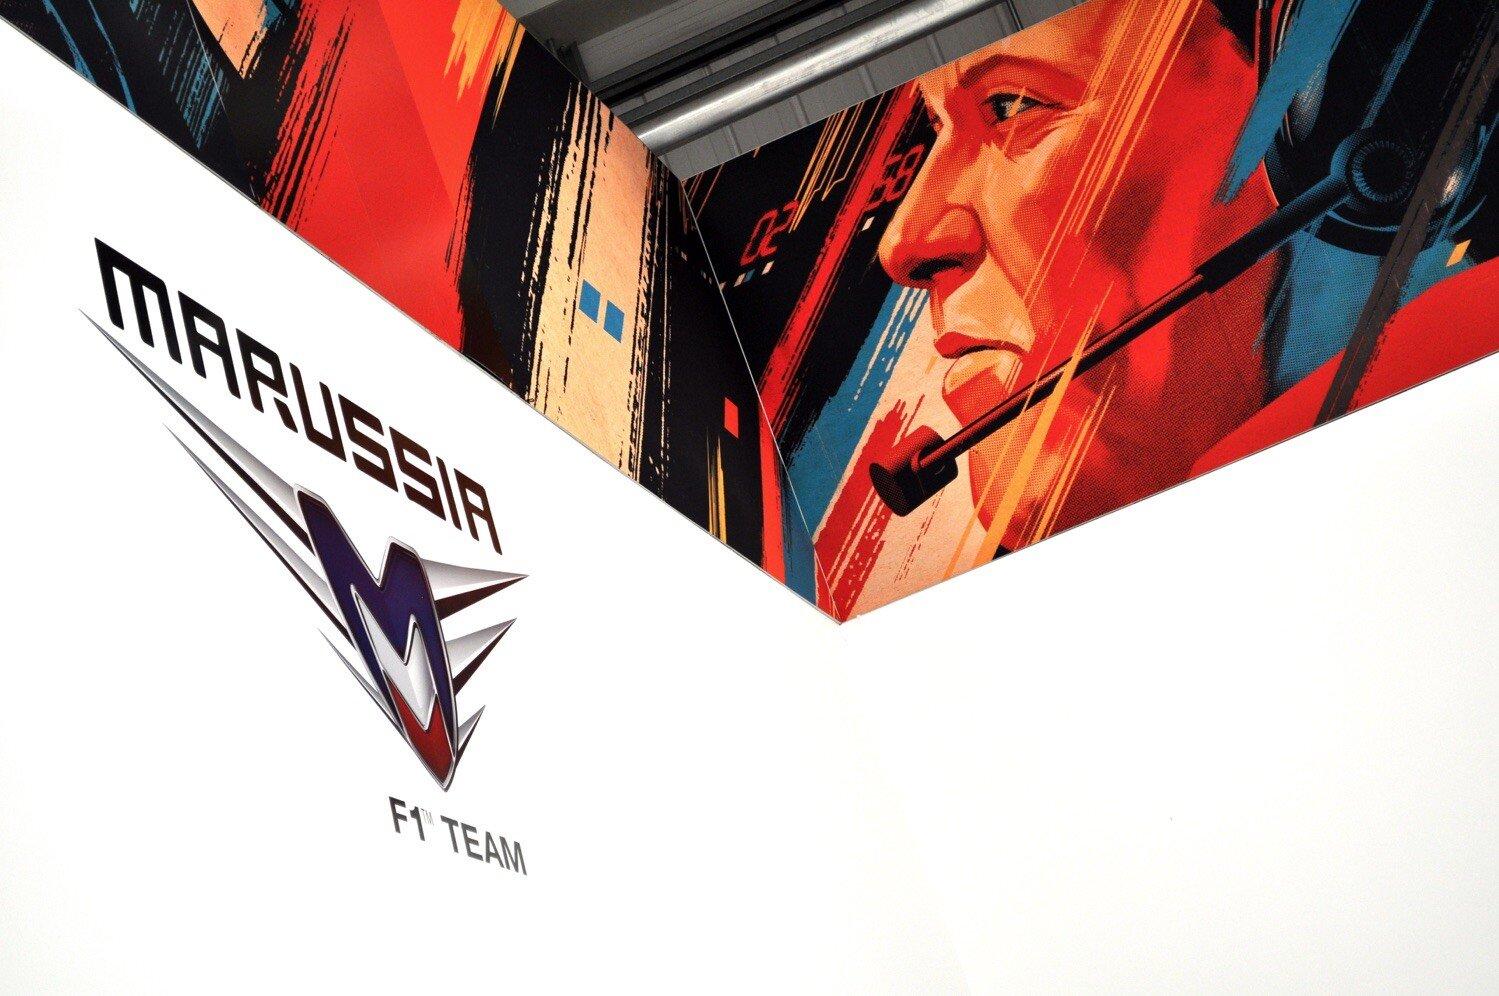 tavis-coburn-F1-team-graphic-illustration-marussia-32.jpg